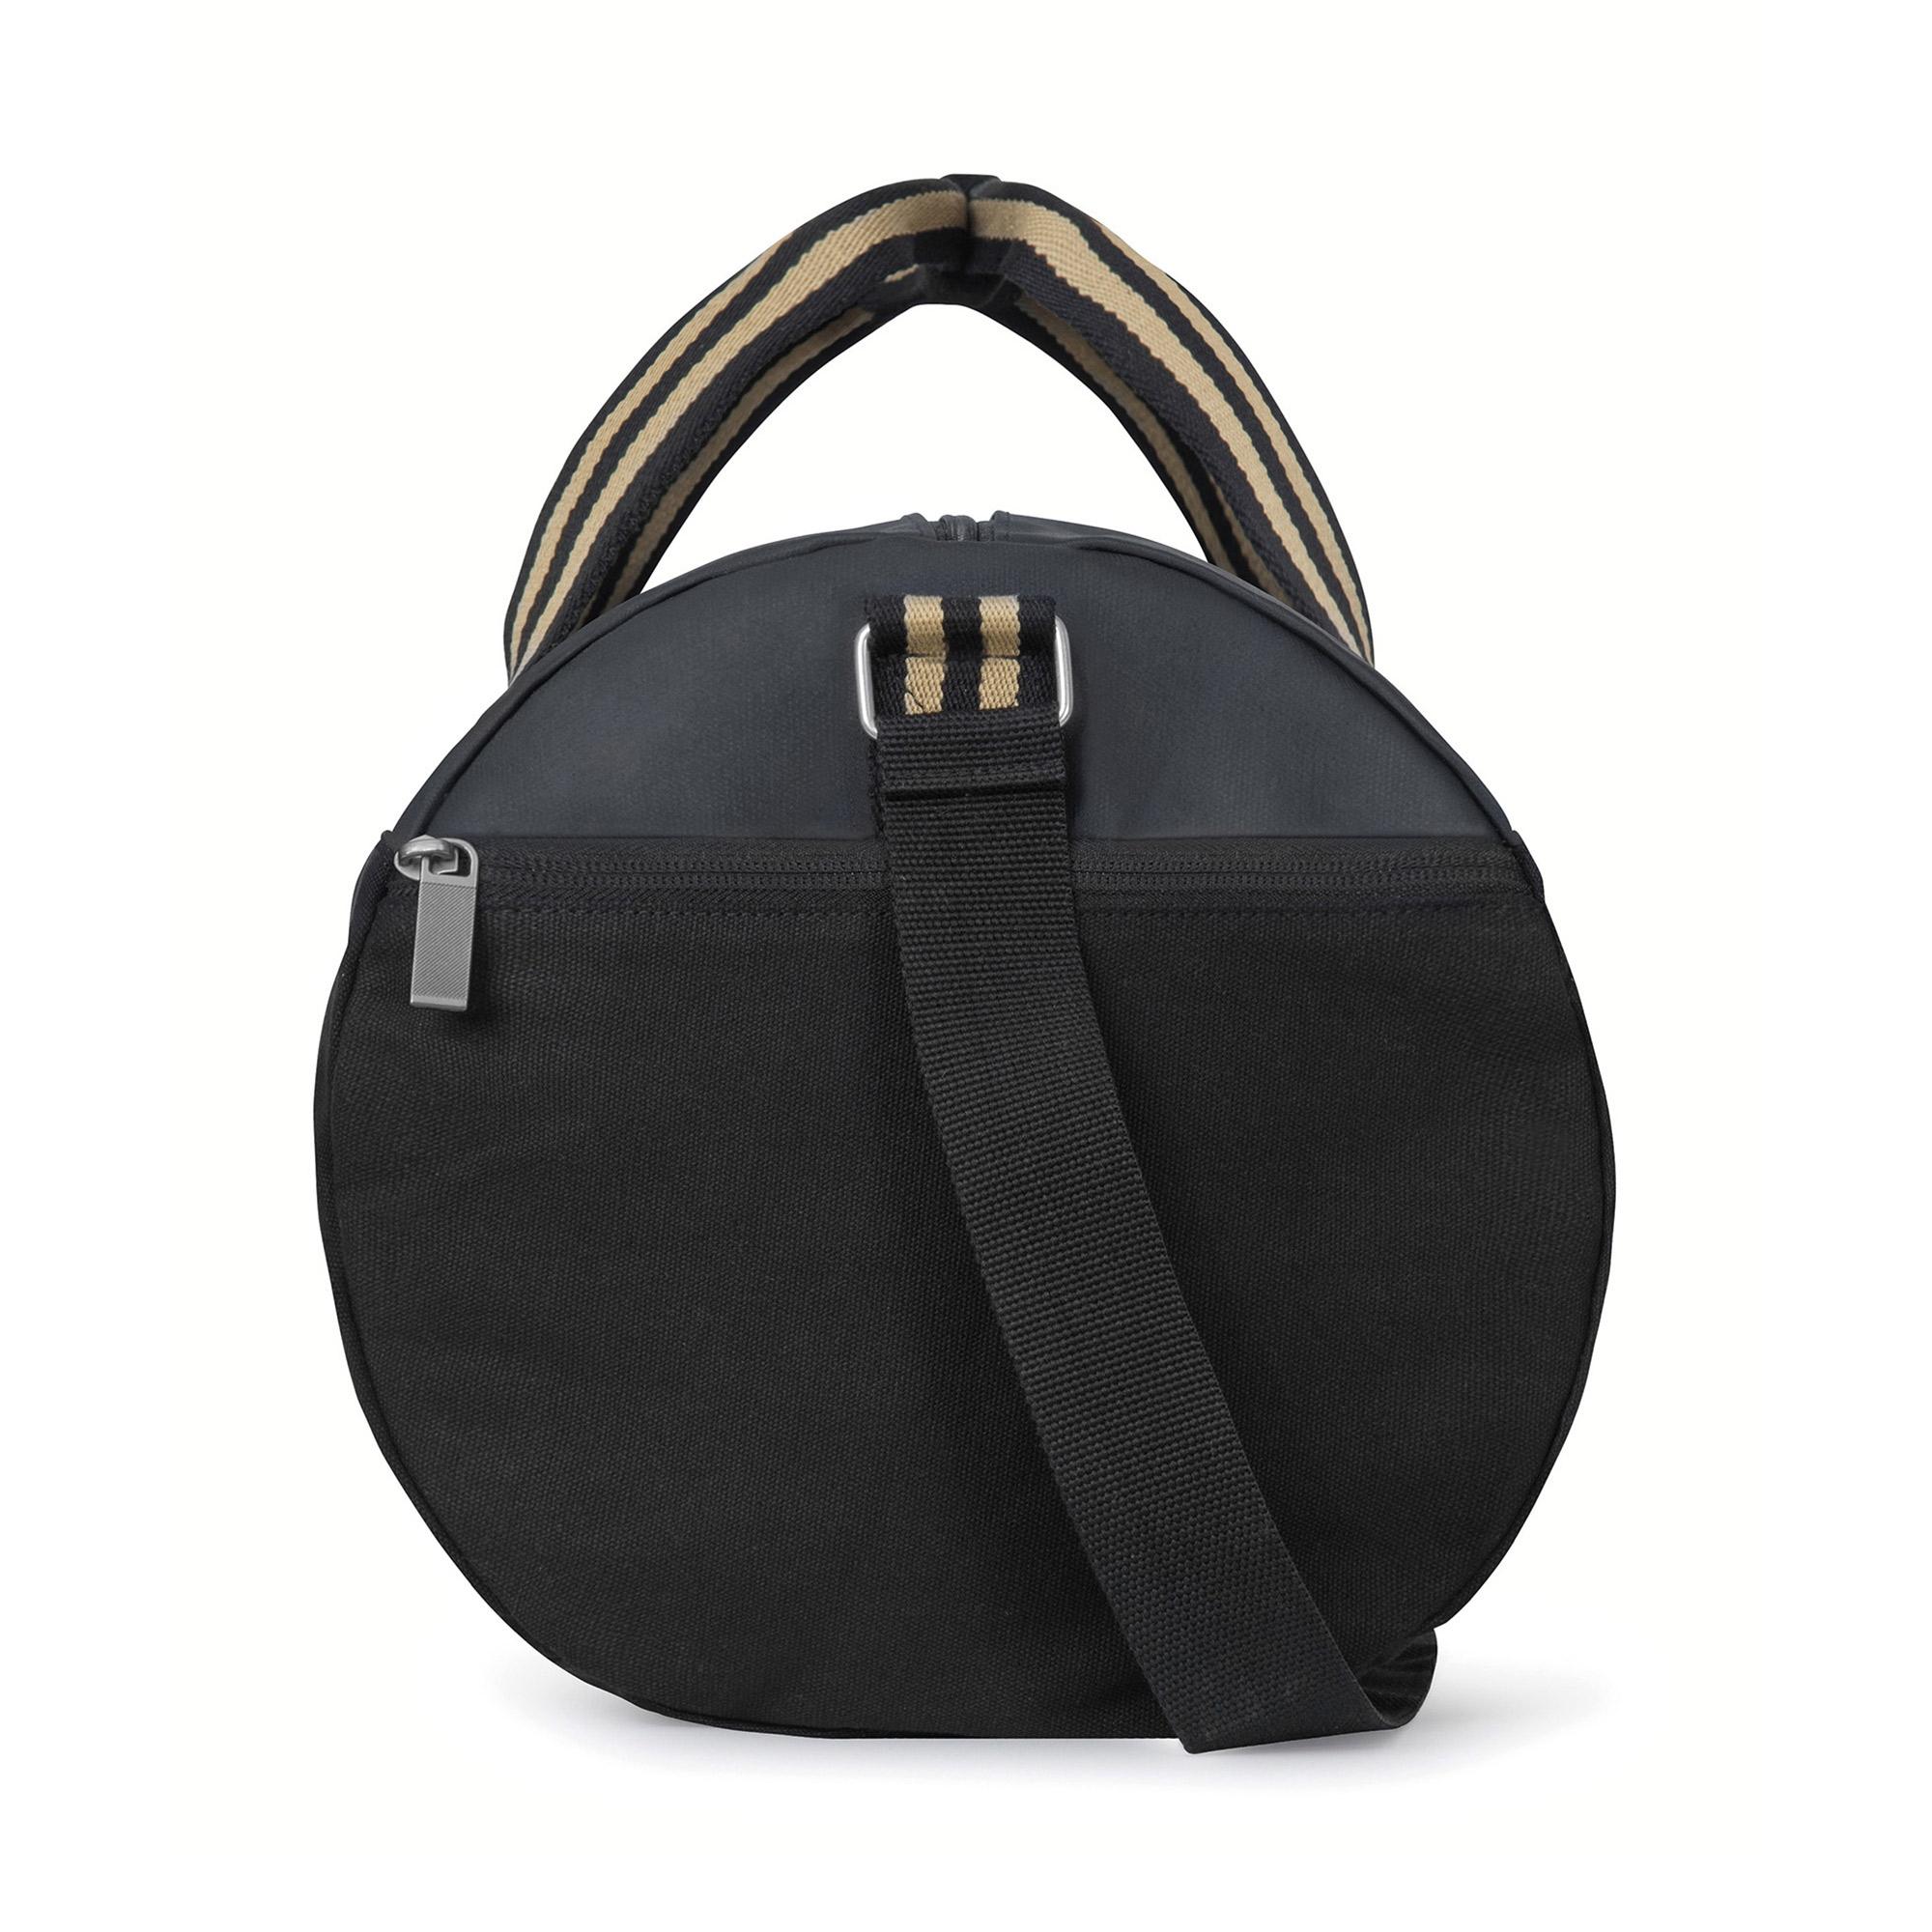 Zippered accessories pocket